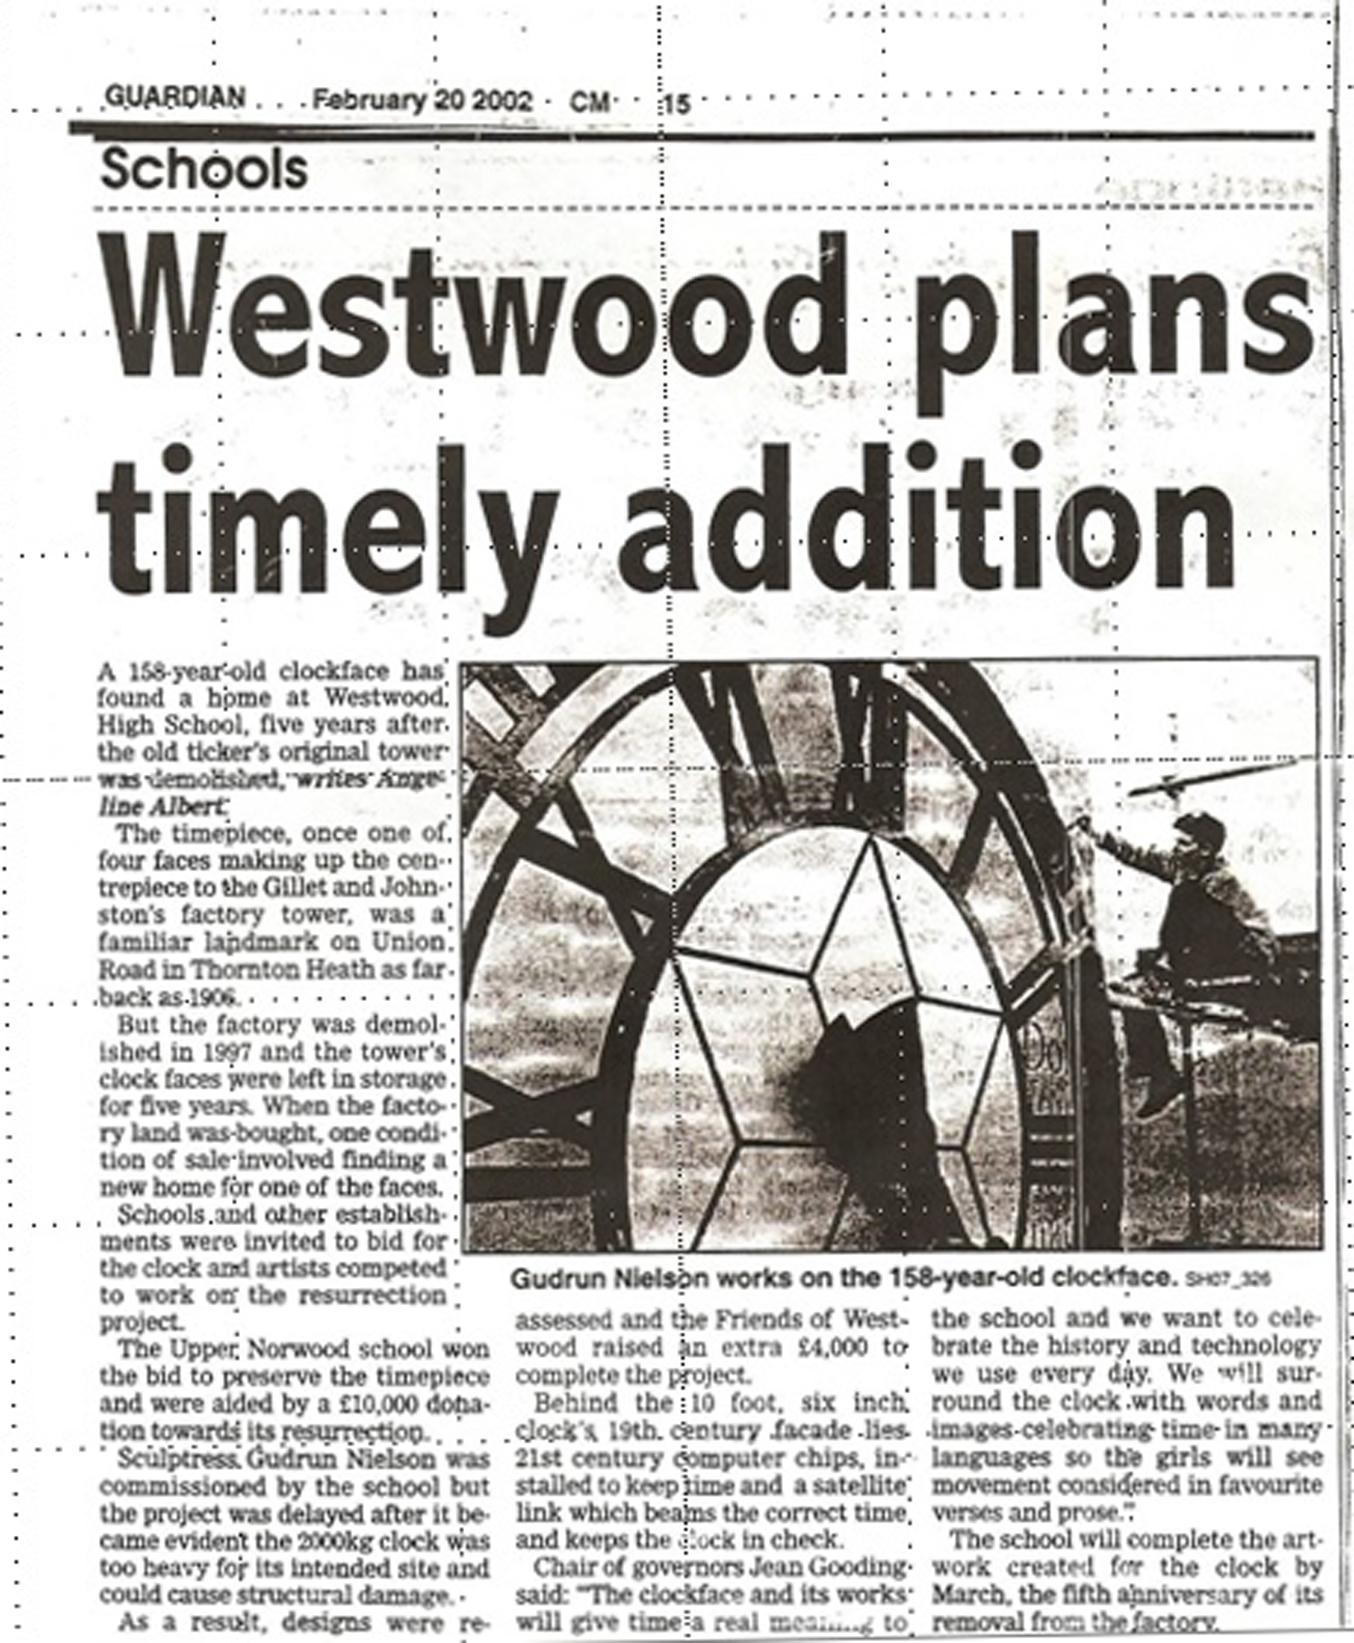 Westwood plans timely addition.jpg